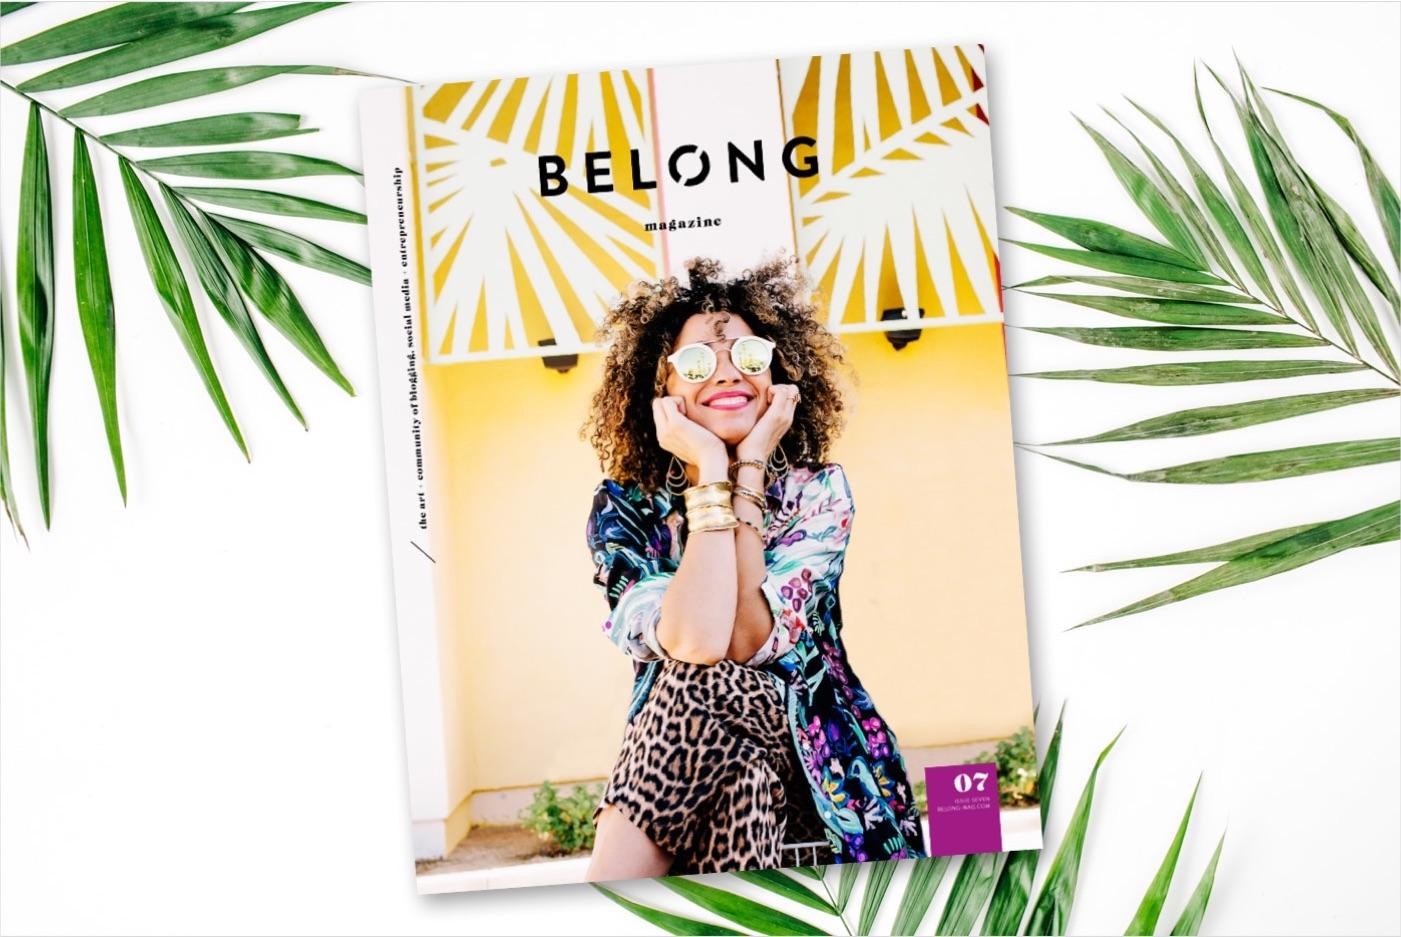 Image via  Belong Magazine